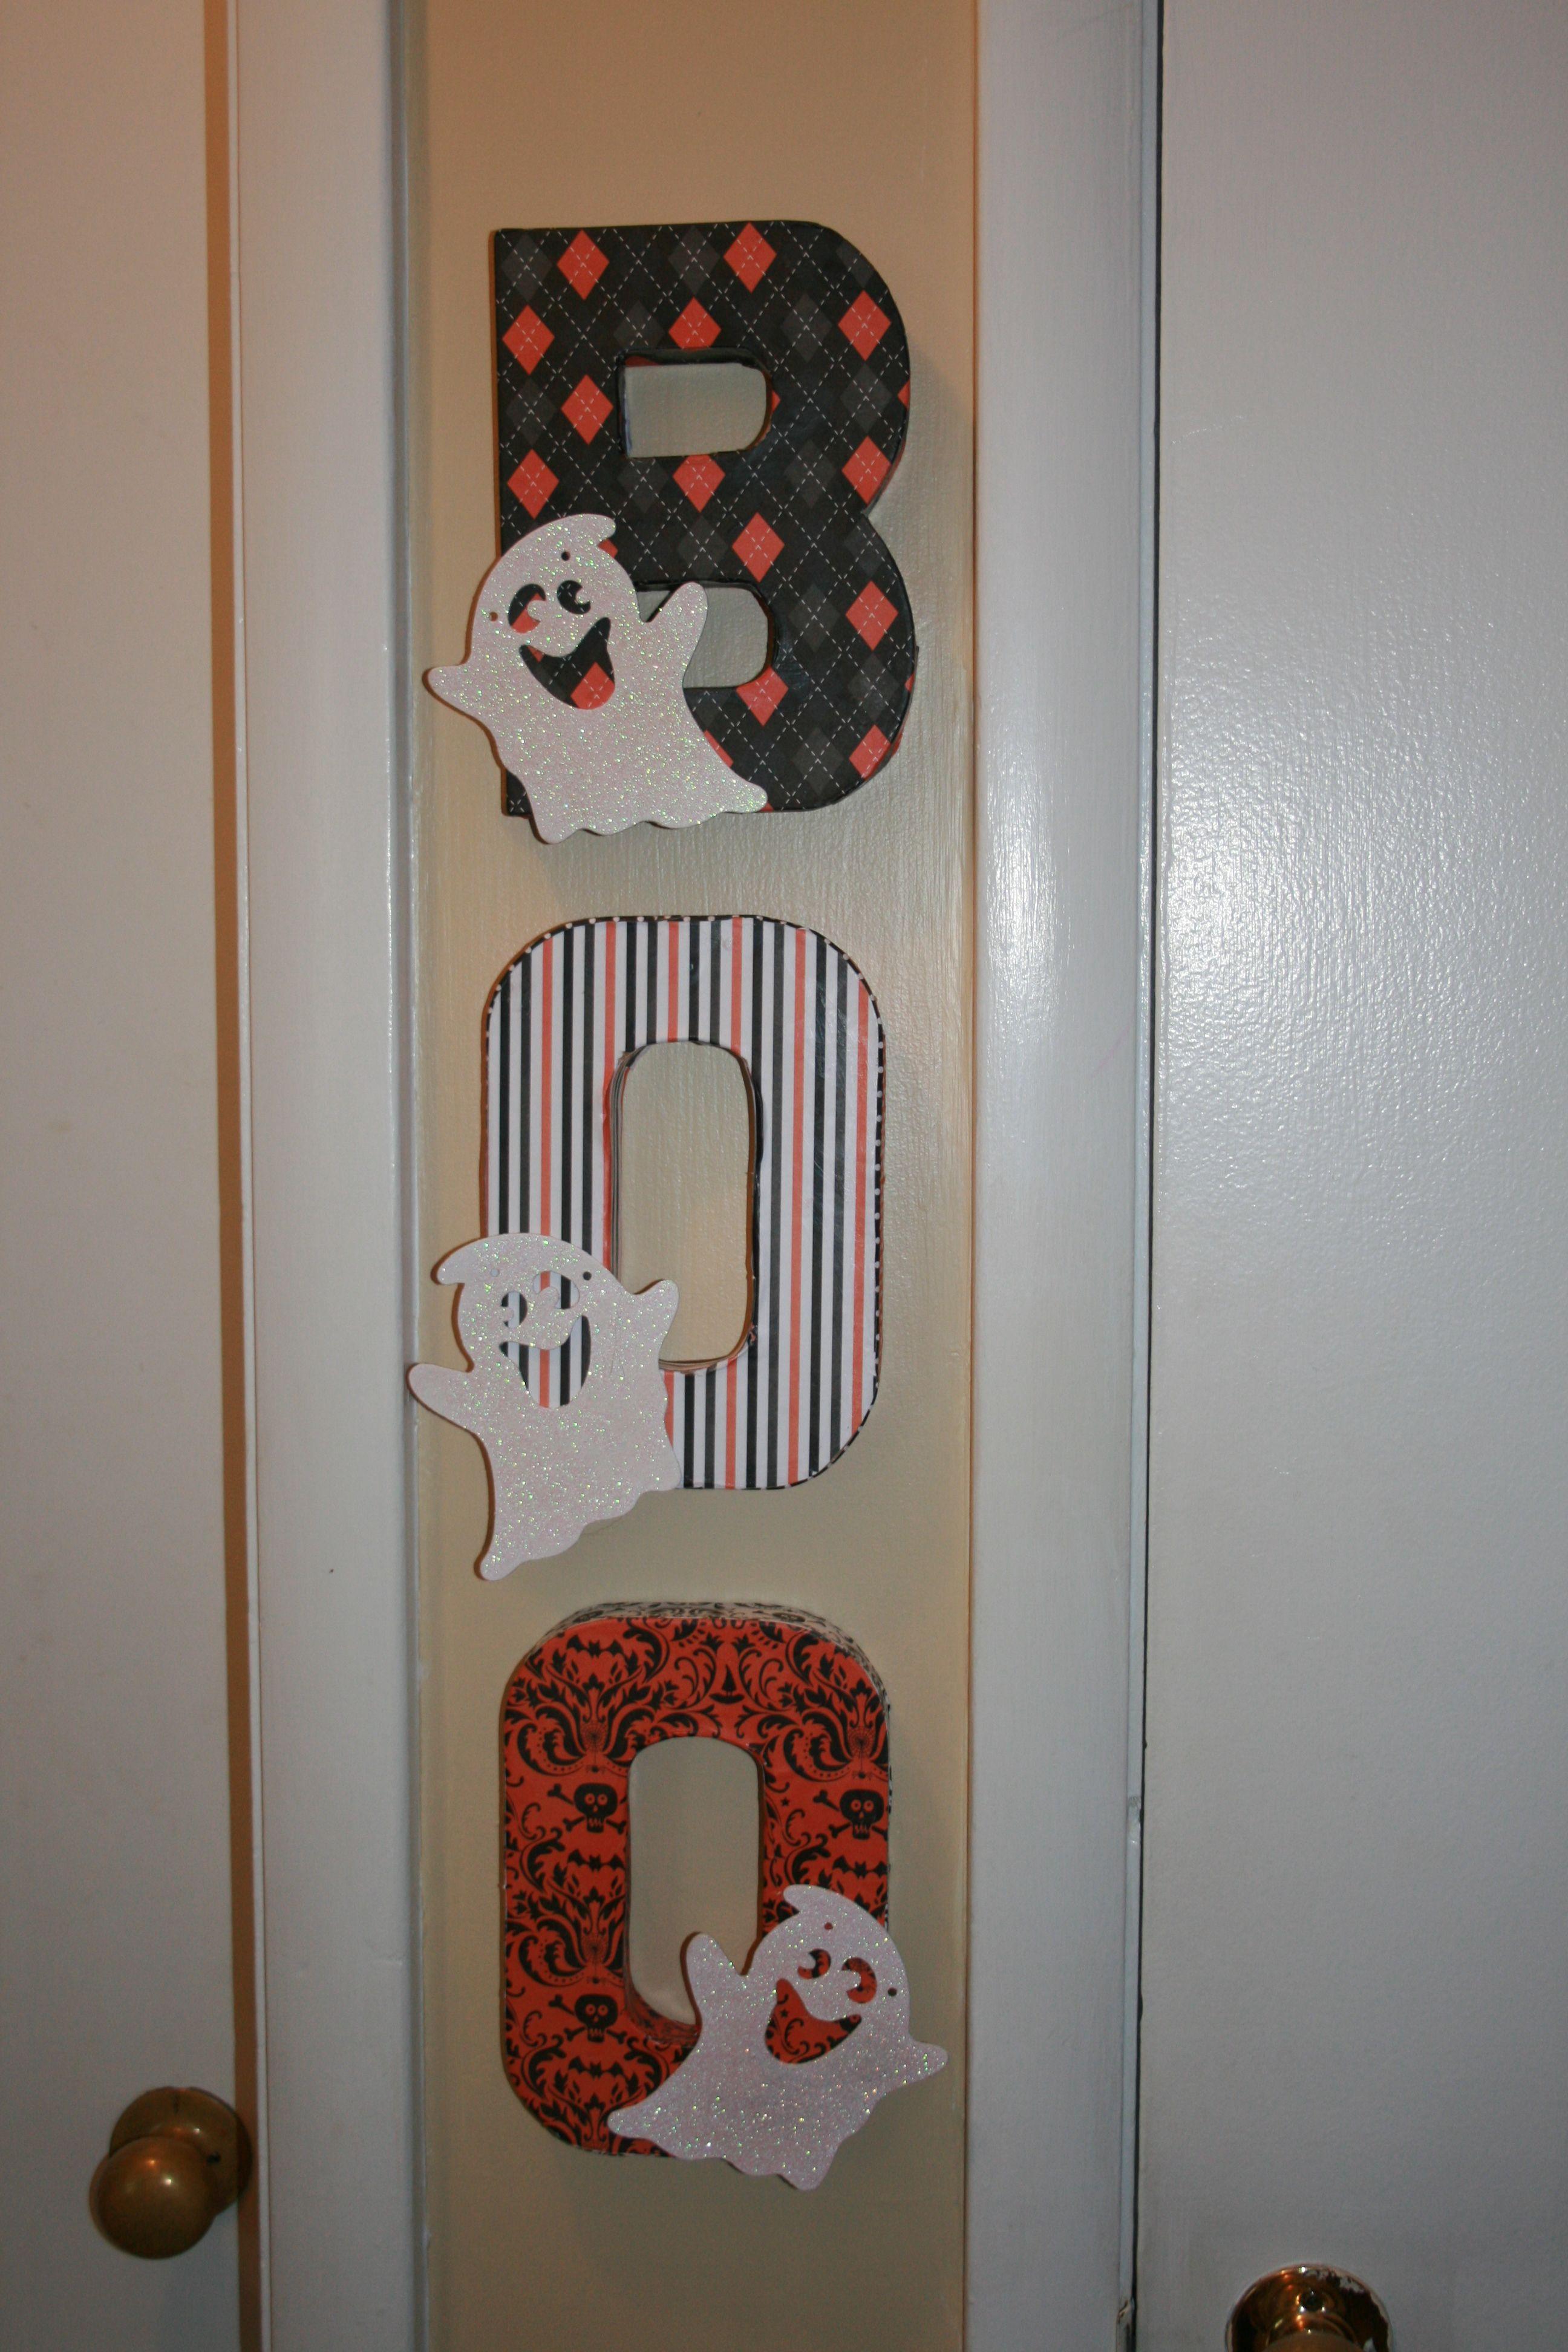 Cardboard Letters From Joanns Scrapbook Paper From Walmart Ghost